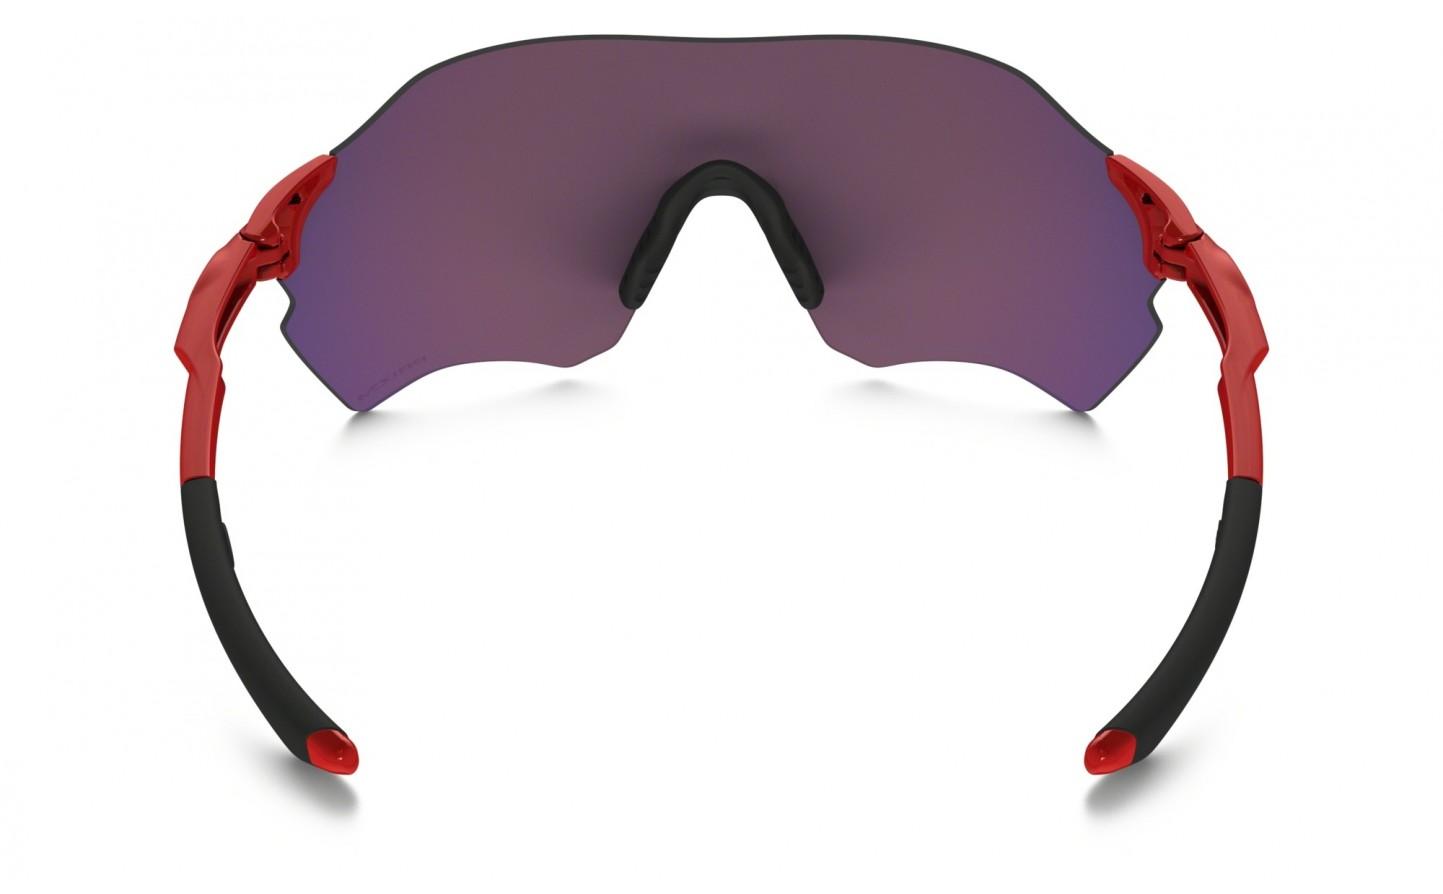 694e792891c01 ... Gafas Sol Oakley Evzero Range Infared Prizm Road